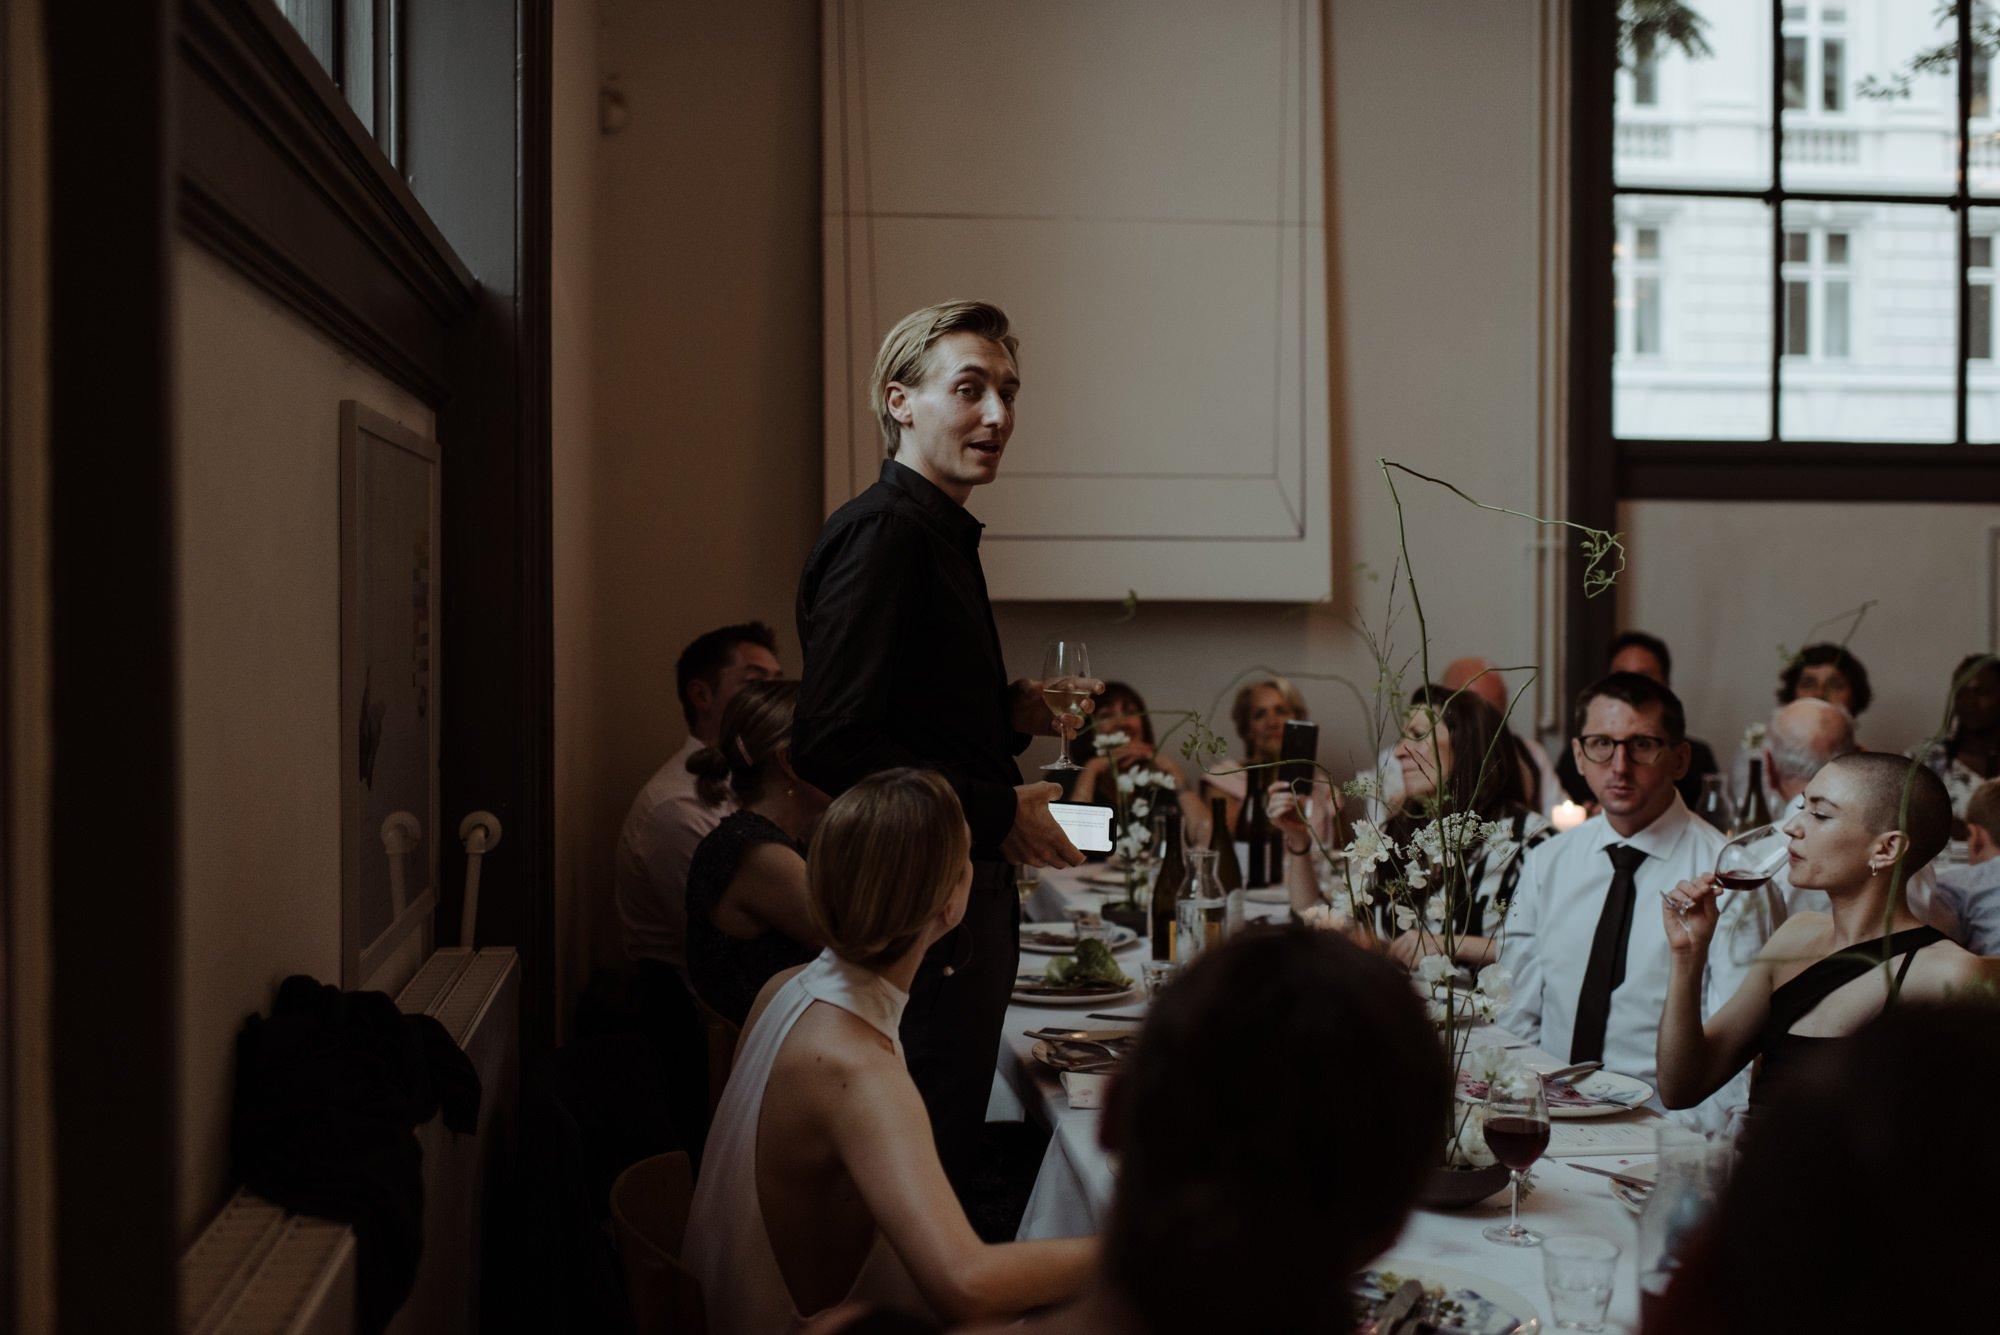 copenhagen wedding photographer 4422 3 1